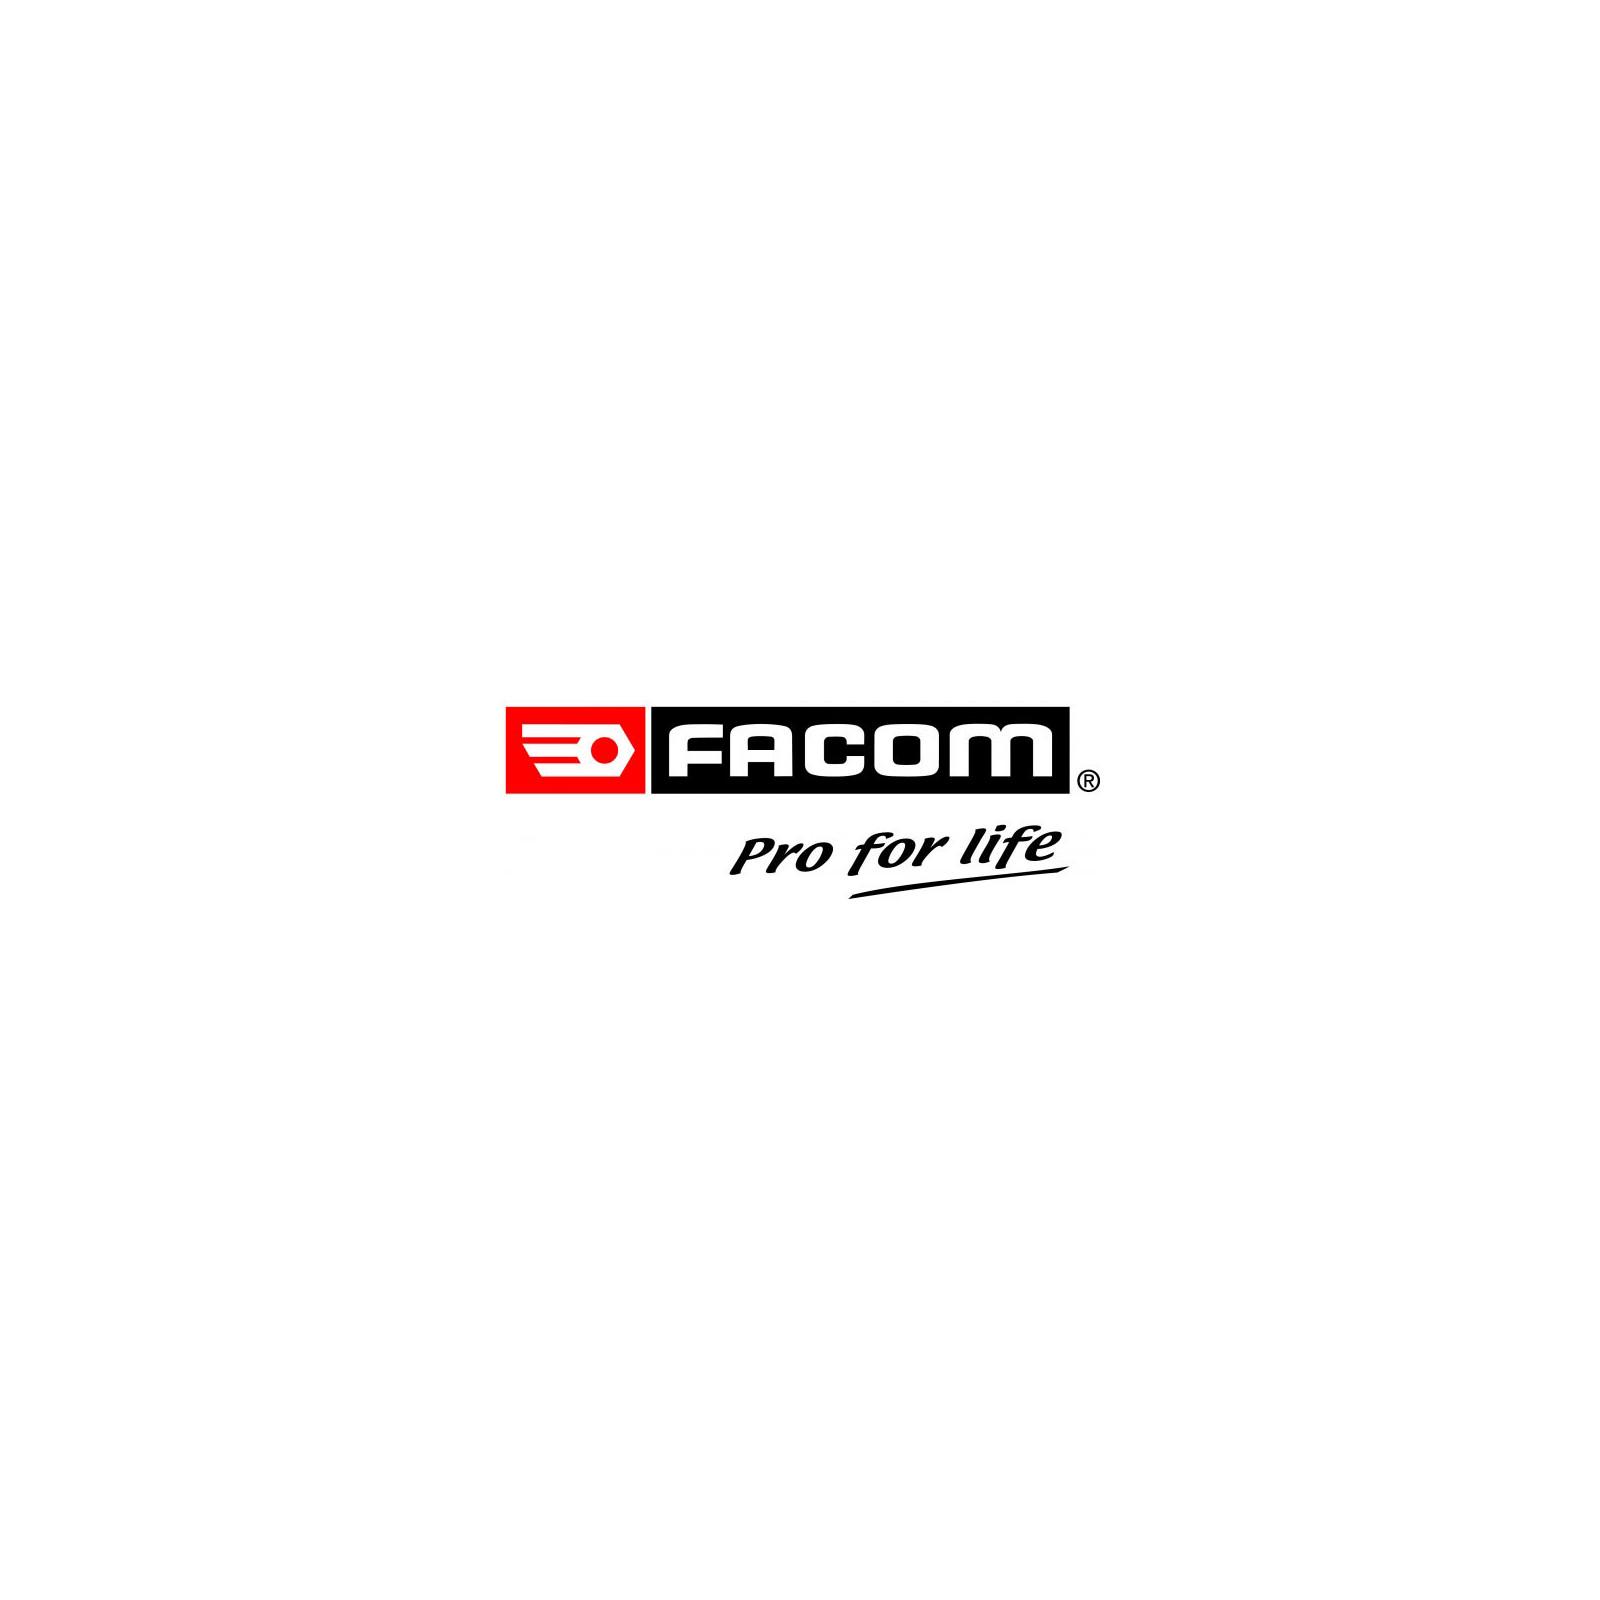 Ens.reparation - Facom 509.RN